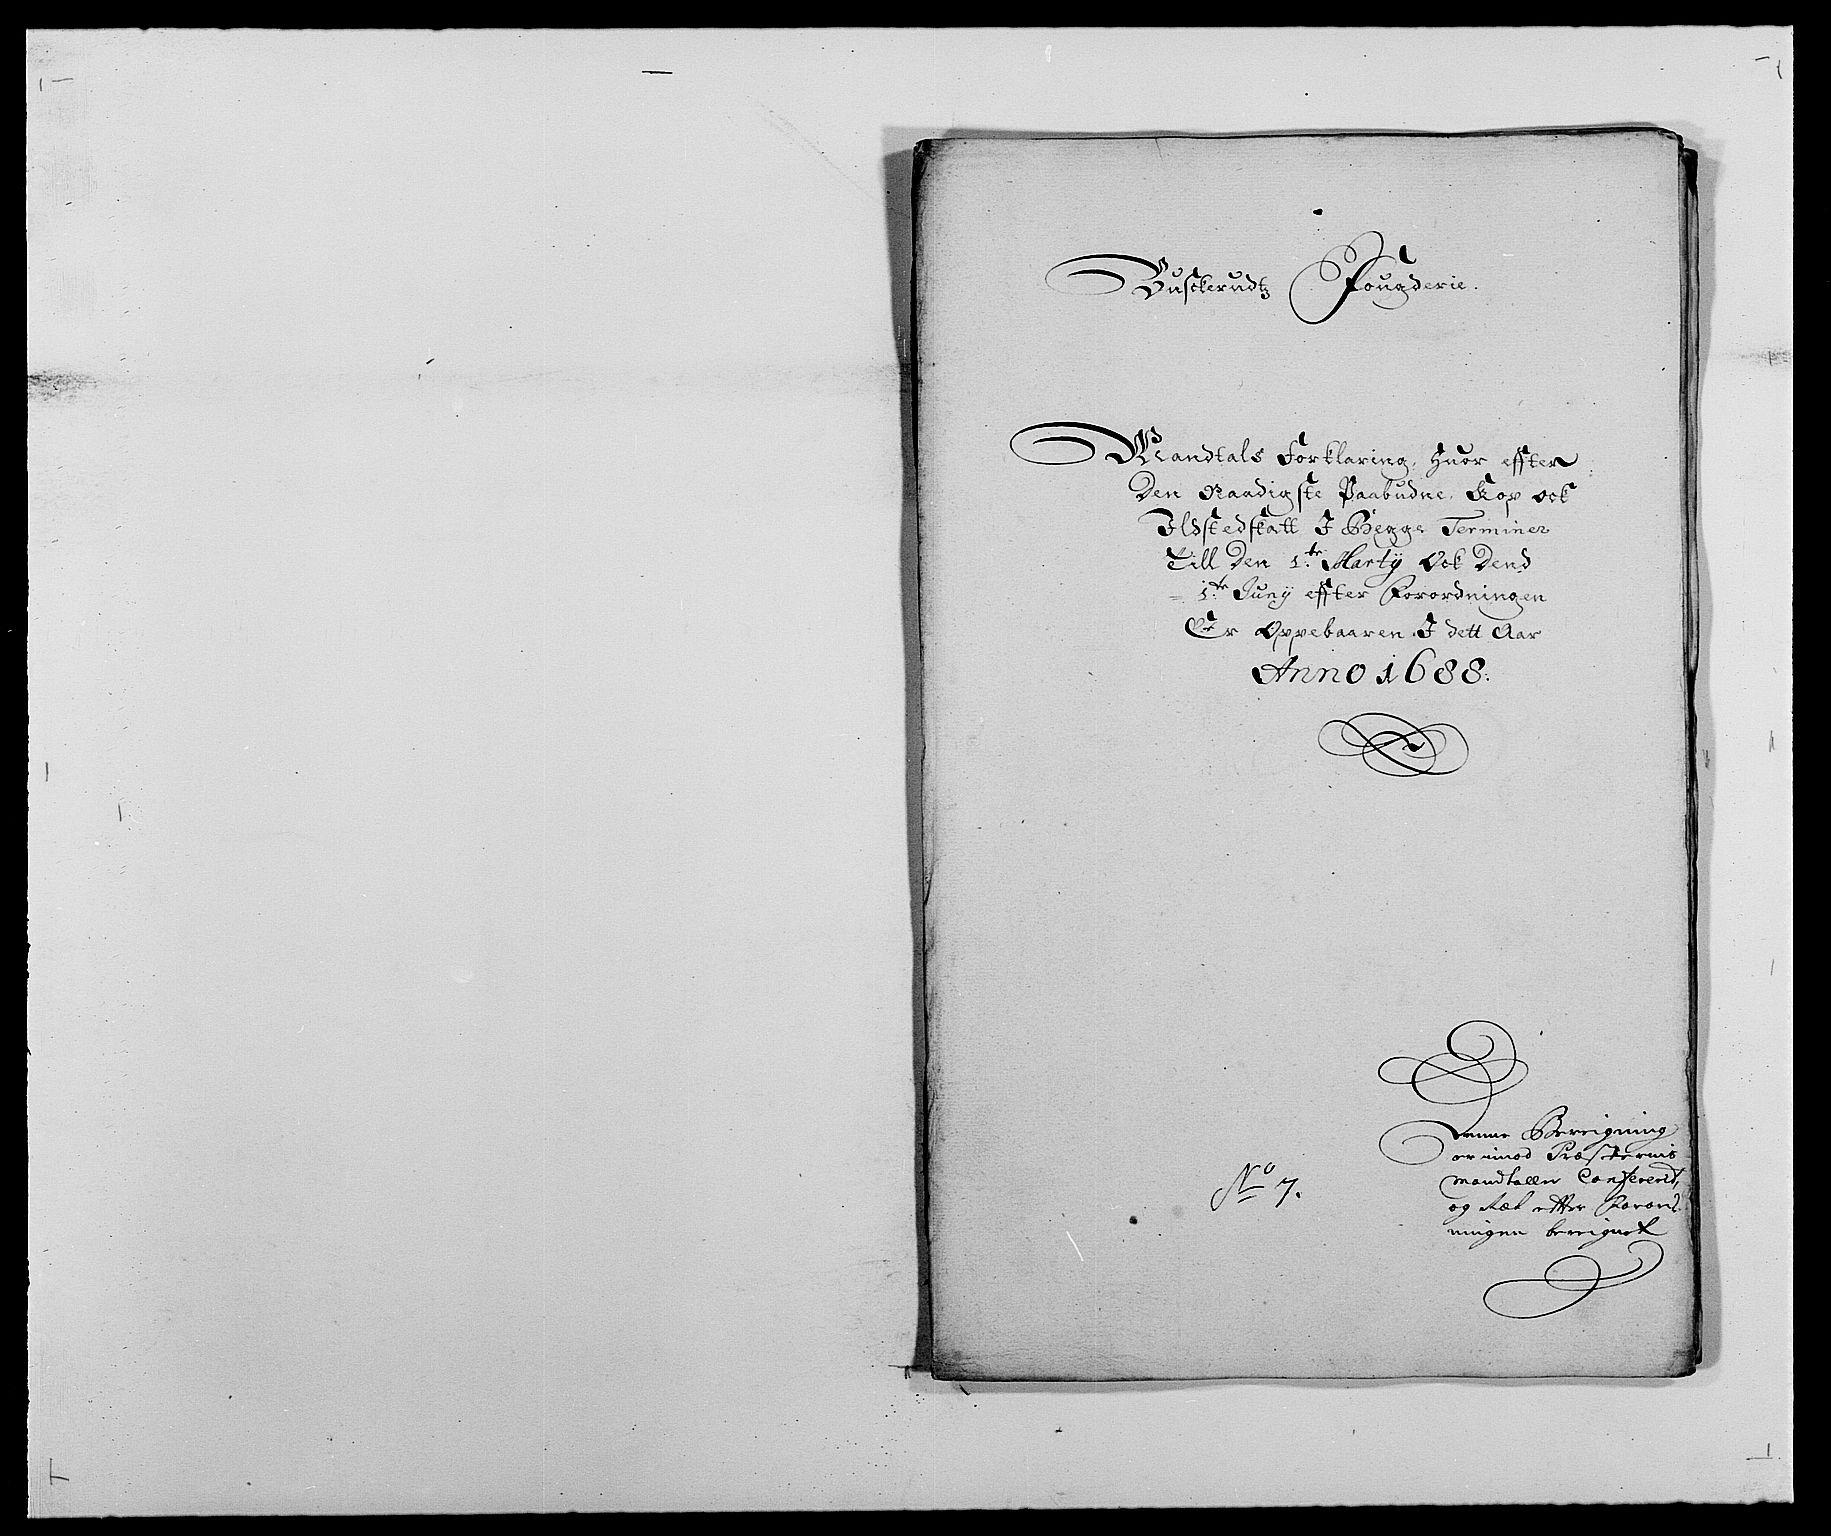 RA, Rentekammeret inntil 1814, Reviderte regnskaper, Fogderegnskap, R25/L1679: Fogderegnskap Buskerud, 1687-1688, s. 462